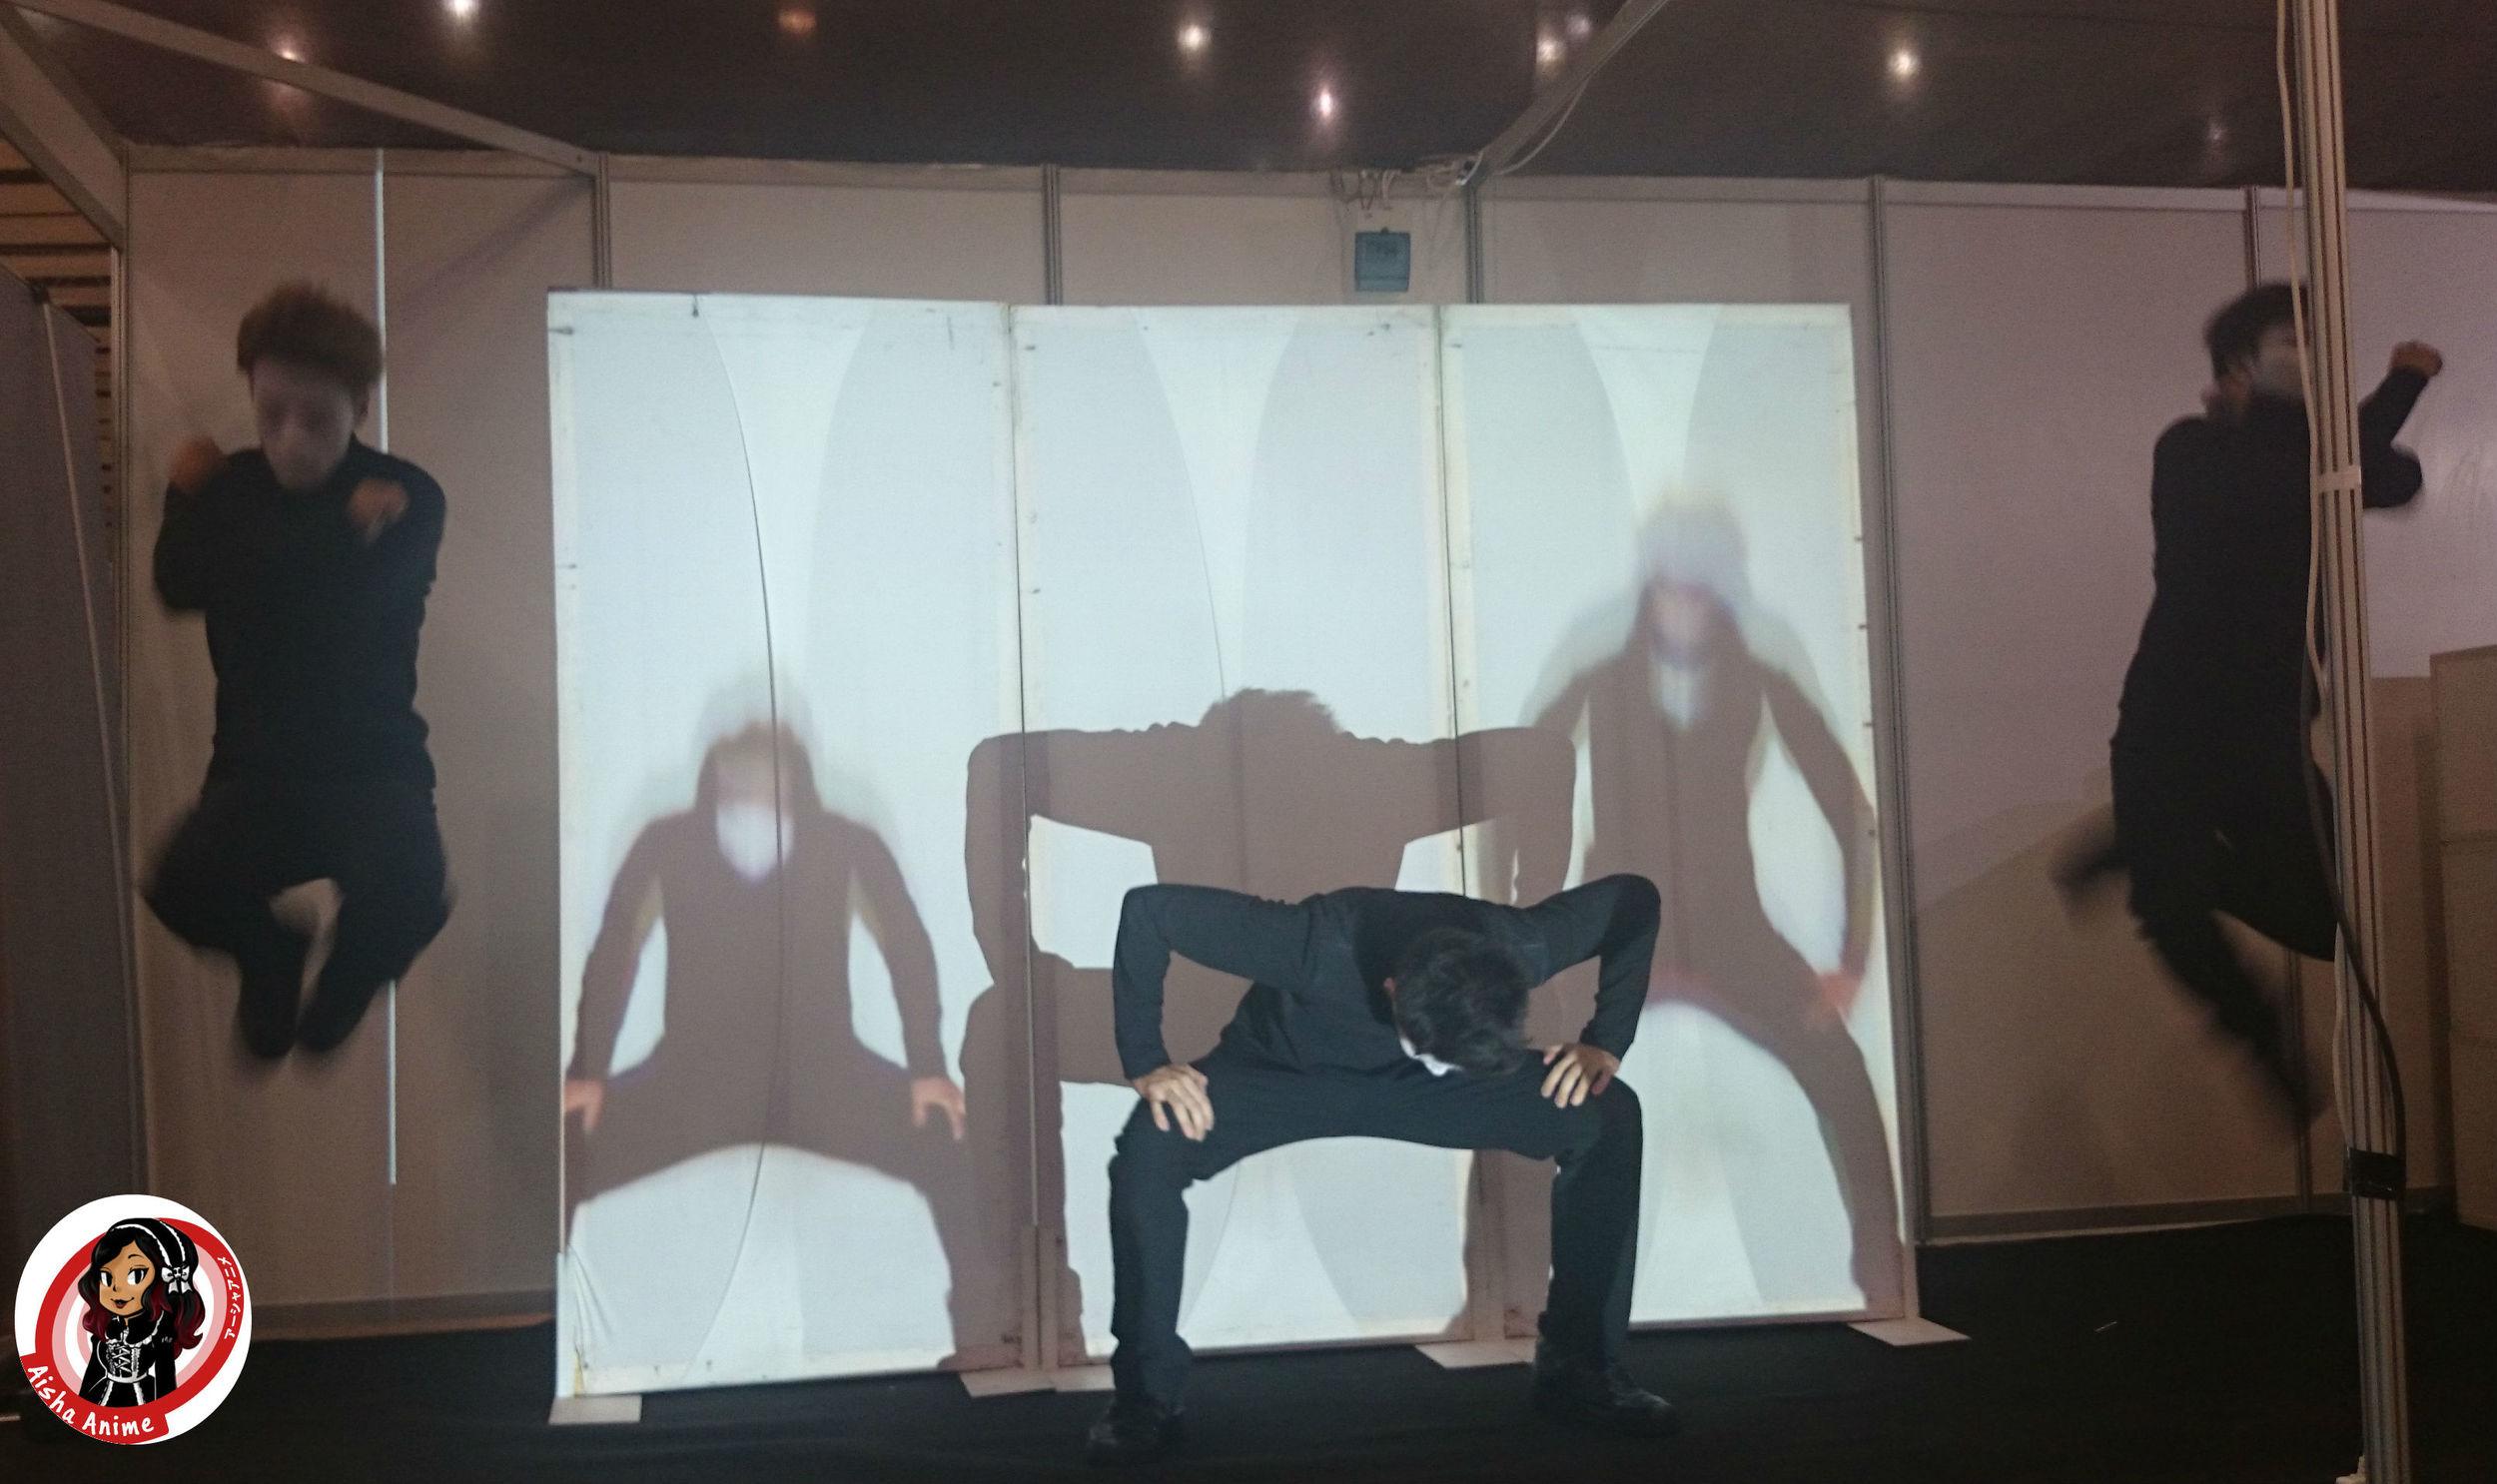 Shiro A demonstrating their music based performances, touring around London in Novemebr